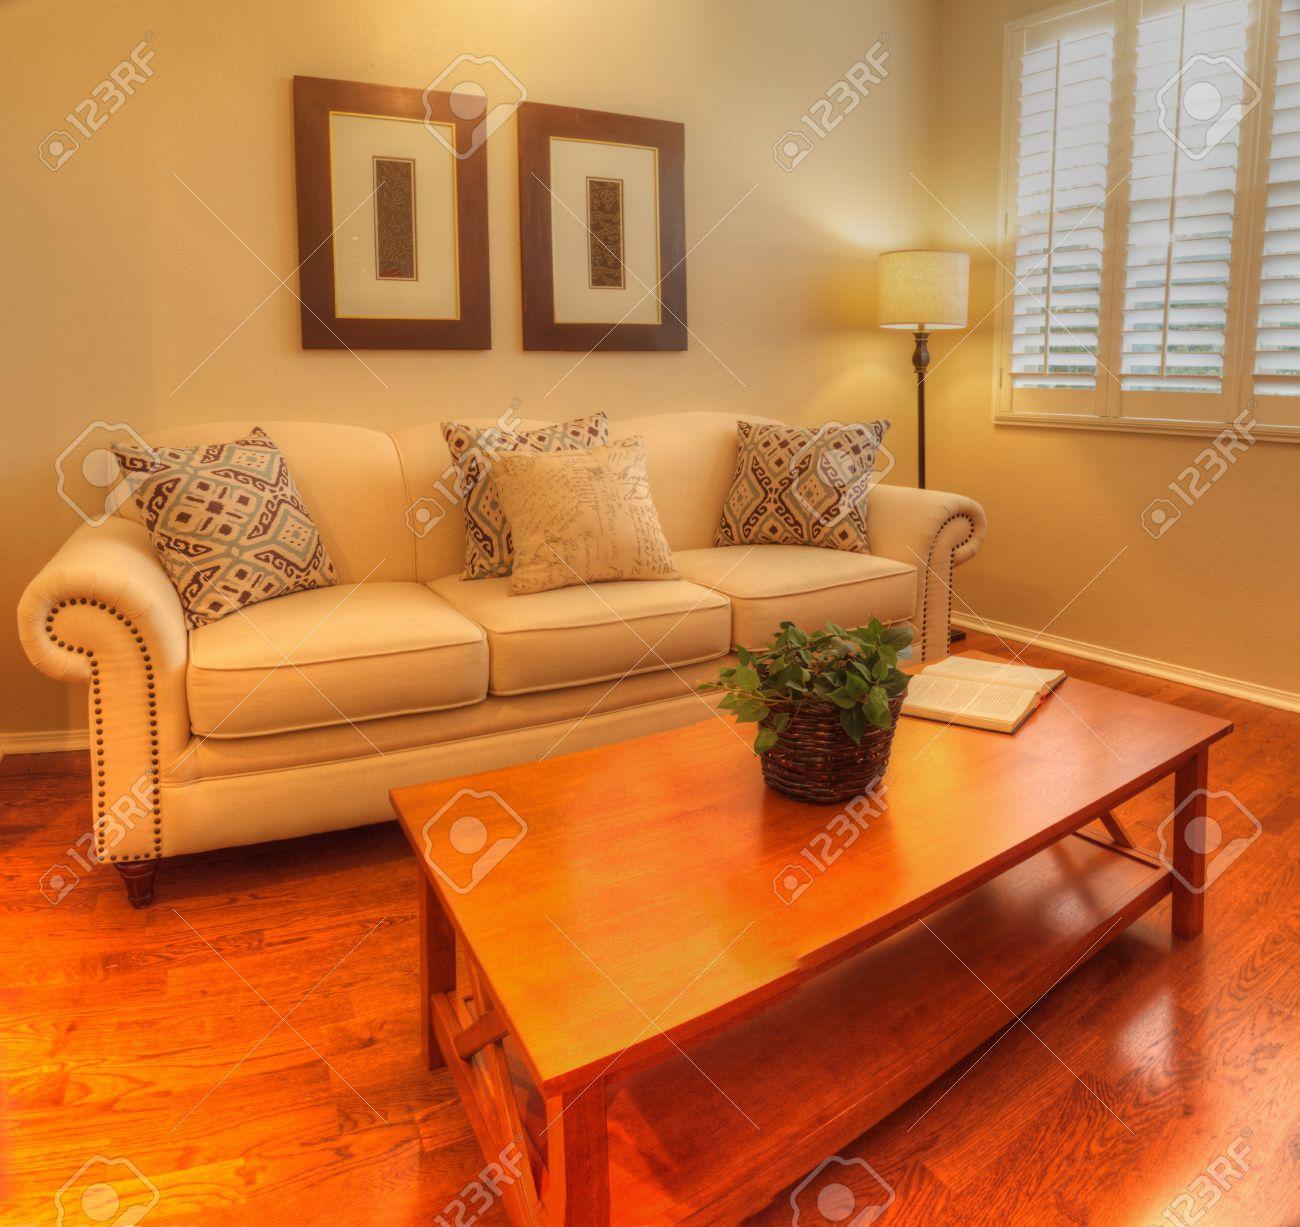 Irvine, CA, USA August 19, 2016: Small living room with a sofa,..